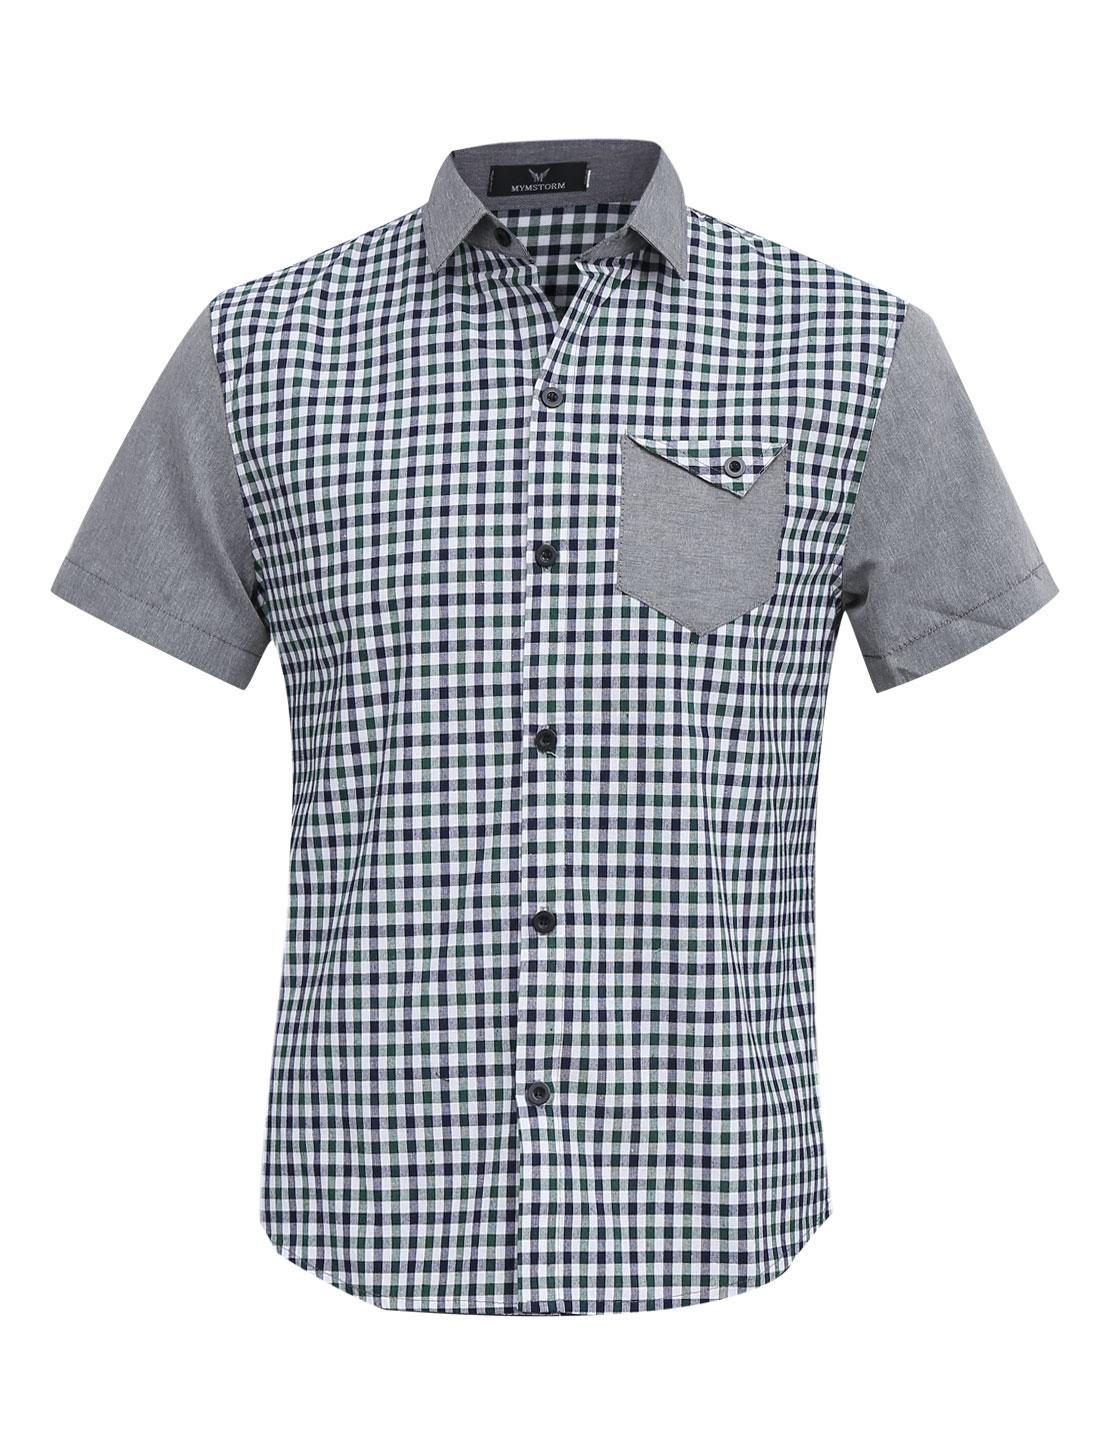 Men Chic Buttons Closed Plaids Pattern Splicing Shirt Green Light Gray M